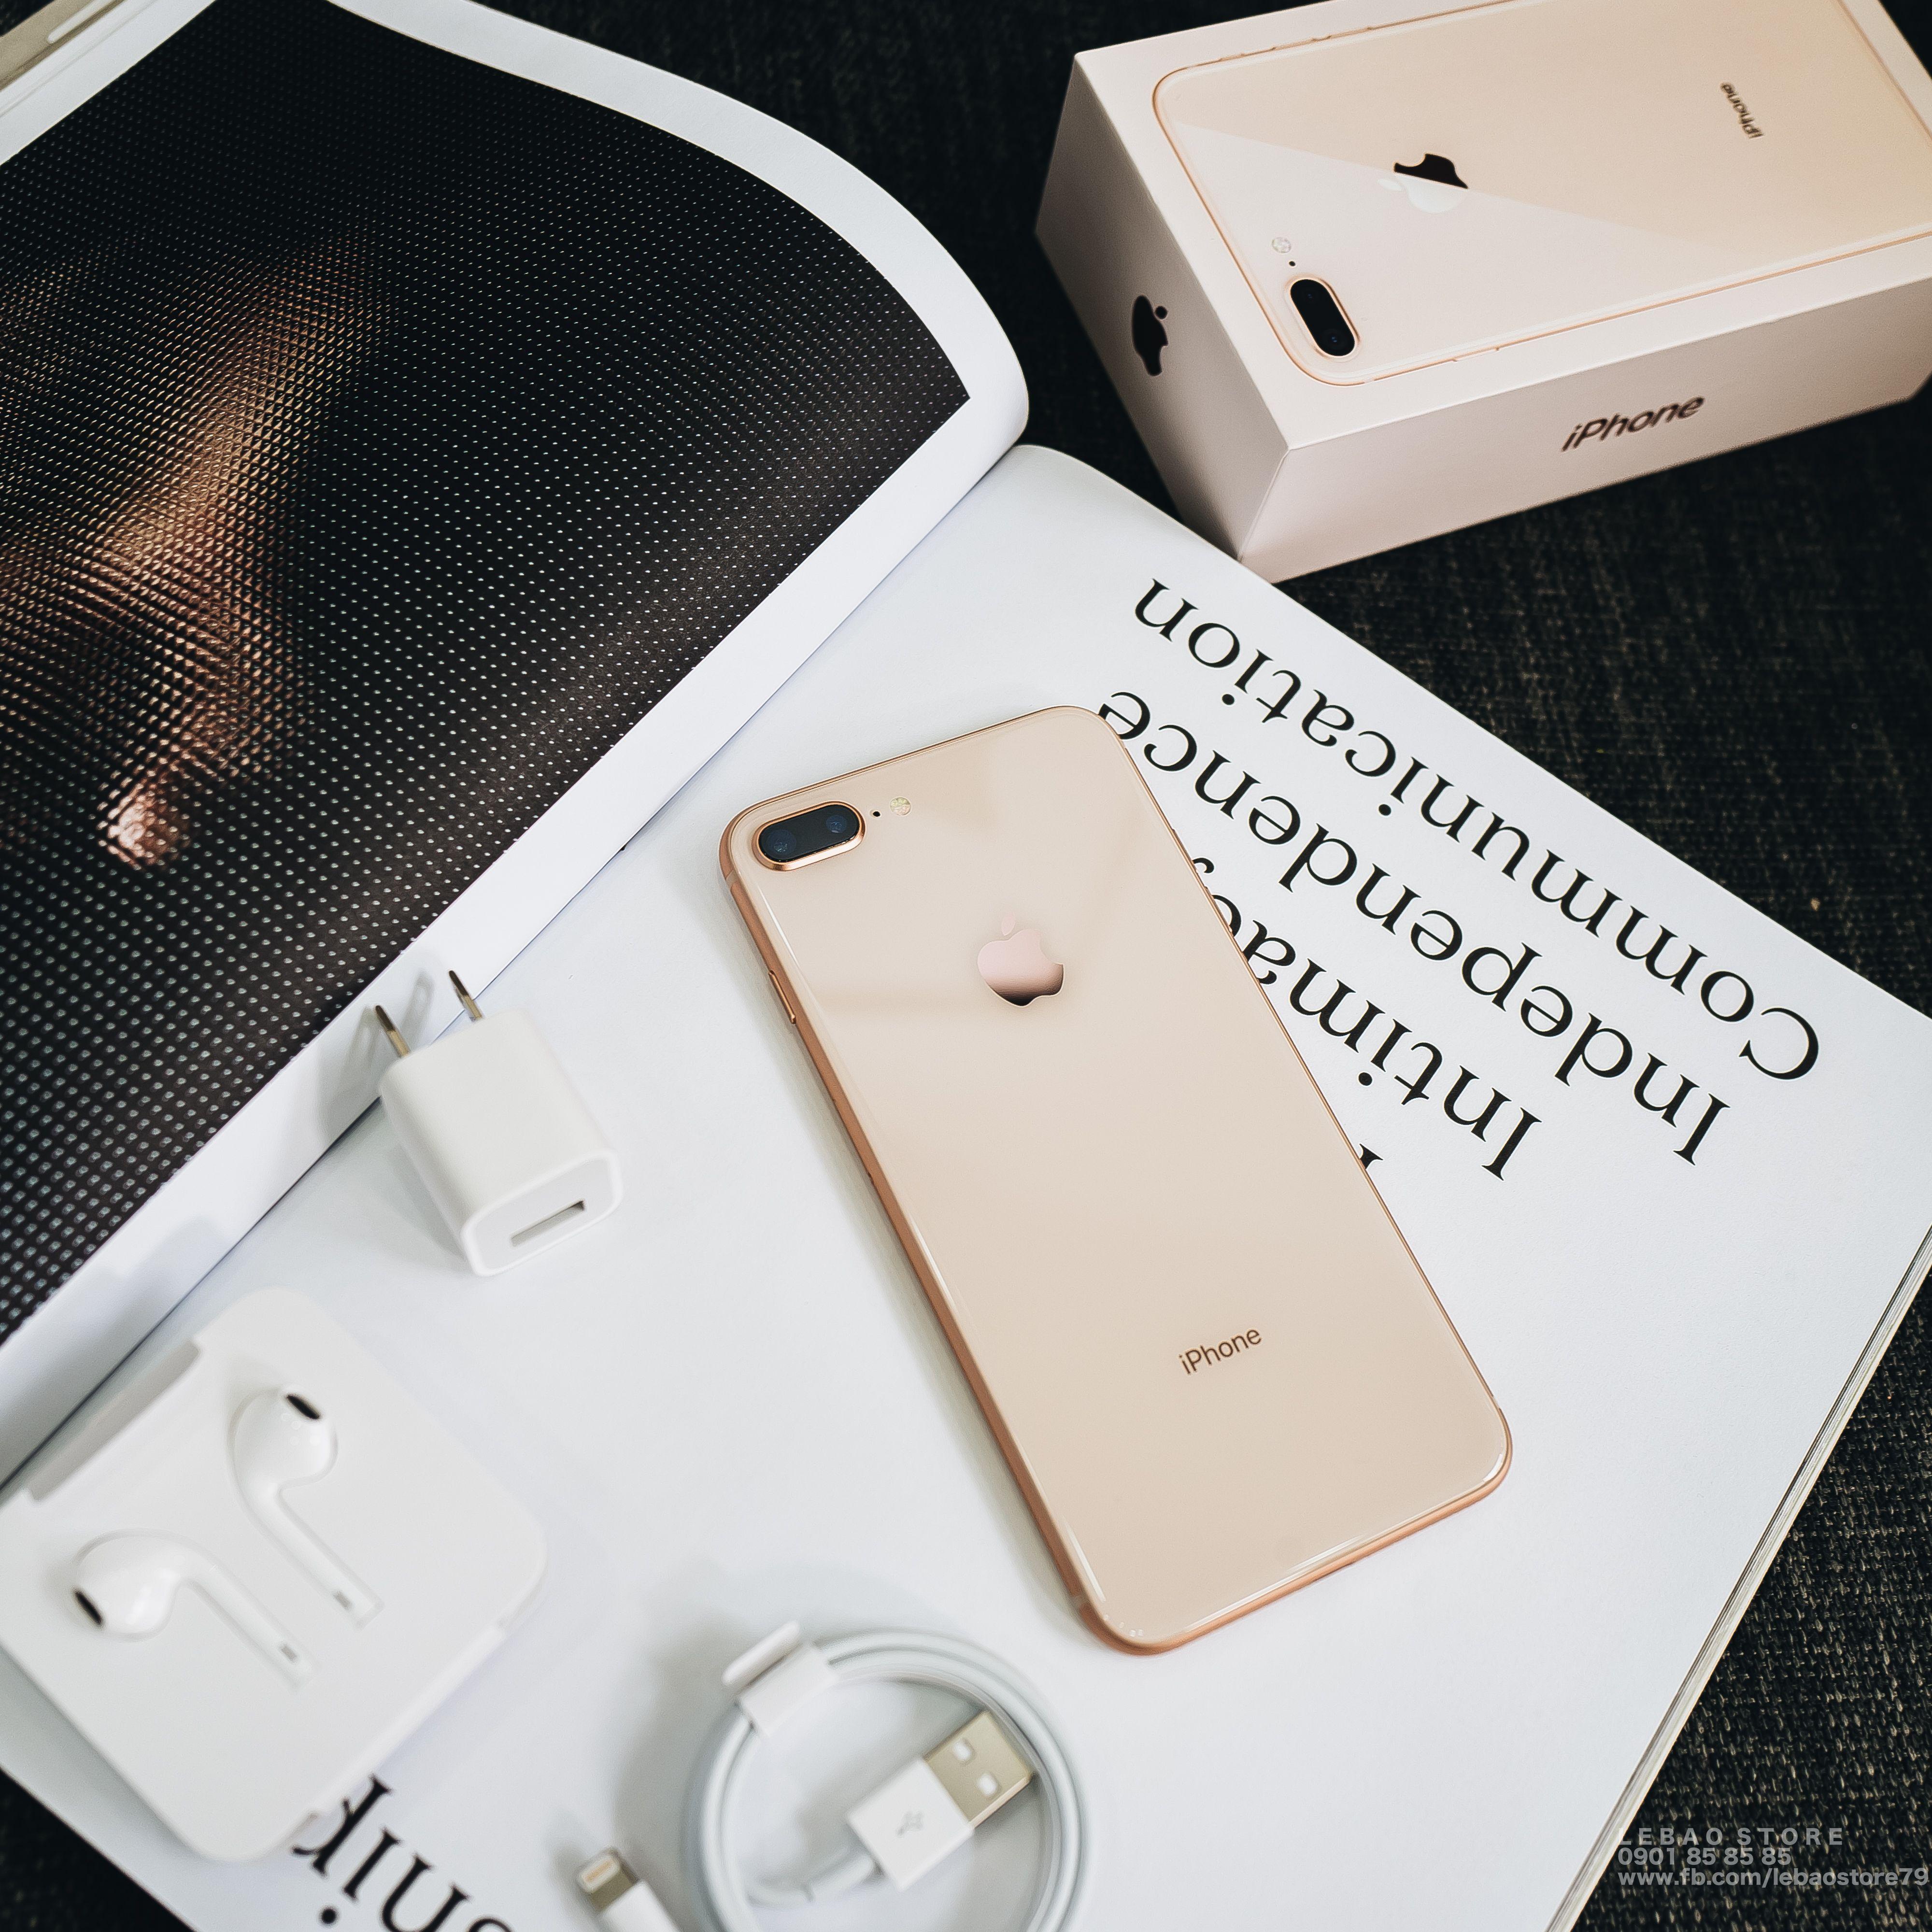 Apple Mac Apple Products Iphone 8 Iphone Cases Bts Zara Apples Korean Cases